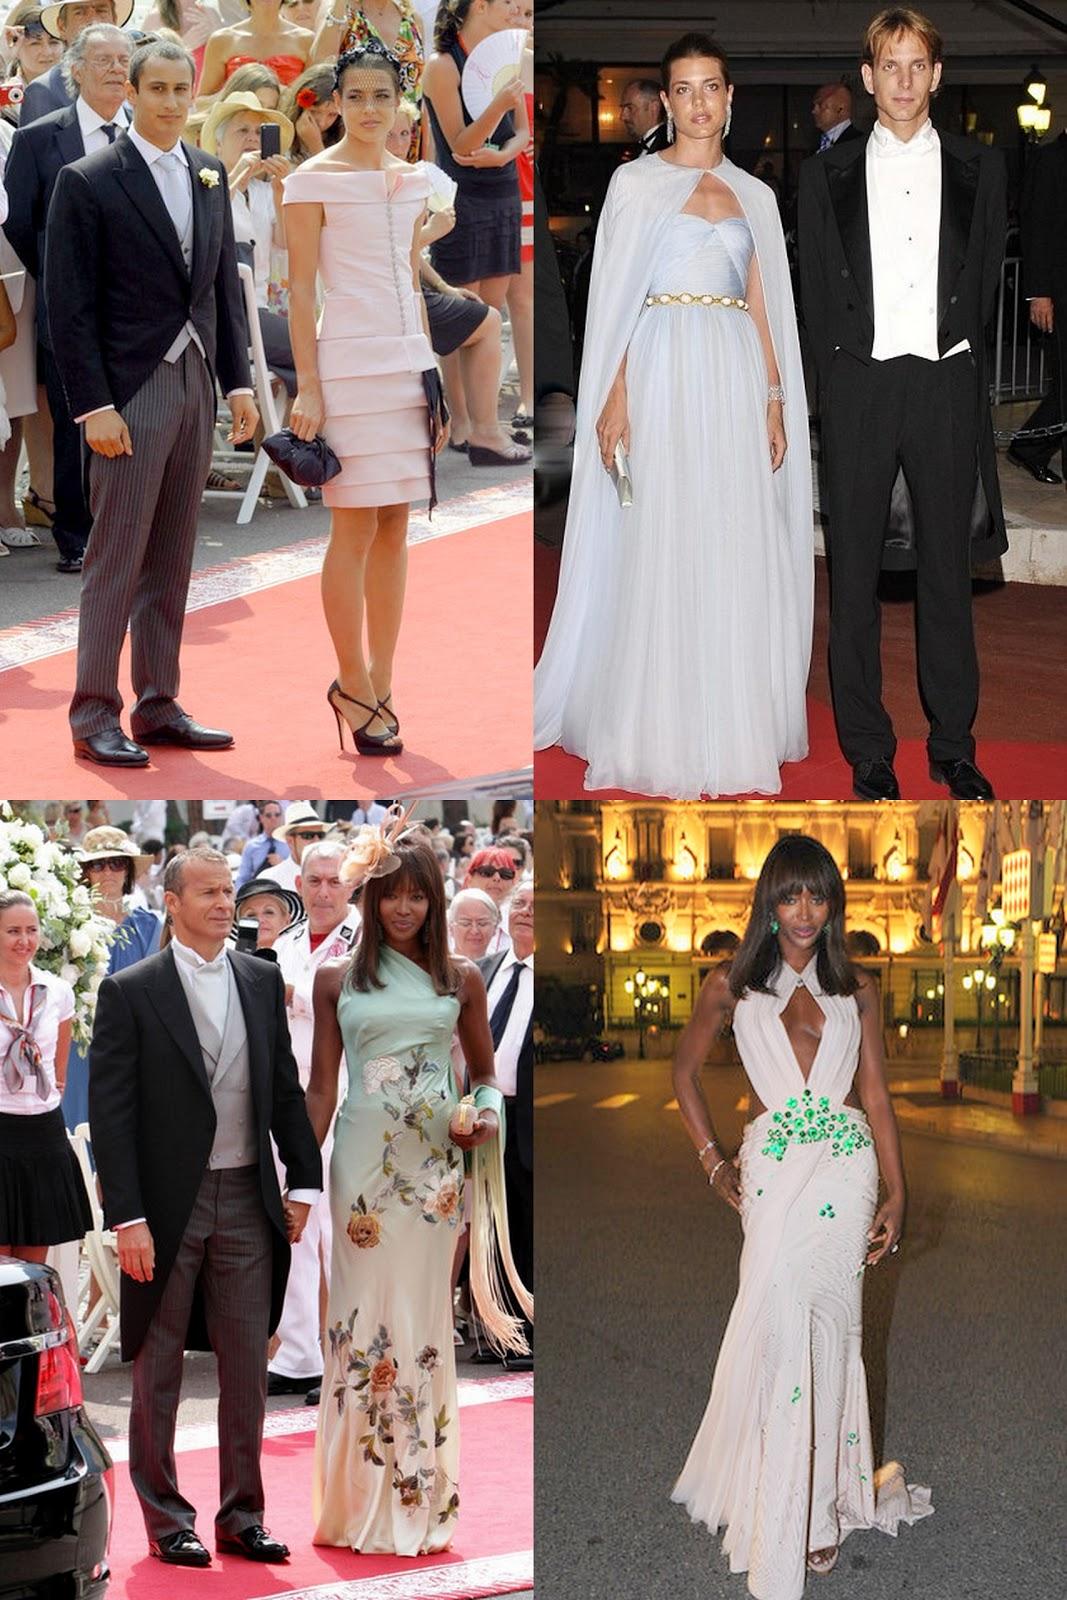 http://4.bp.blogspot.com/-H_bFN25cm1U/ThBoC5PgrxI/AAAAAAAAA2Y/dkBssH0Lex0/s1600/monaco+wedding1.jpg